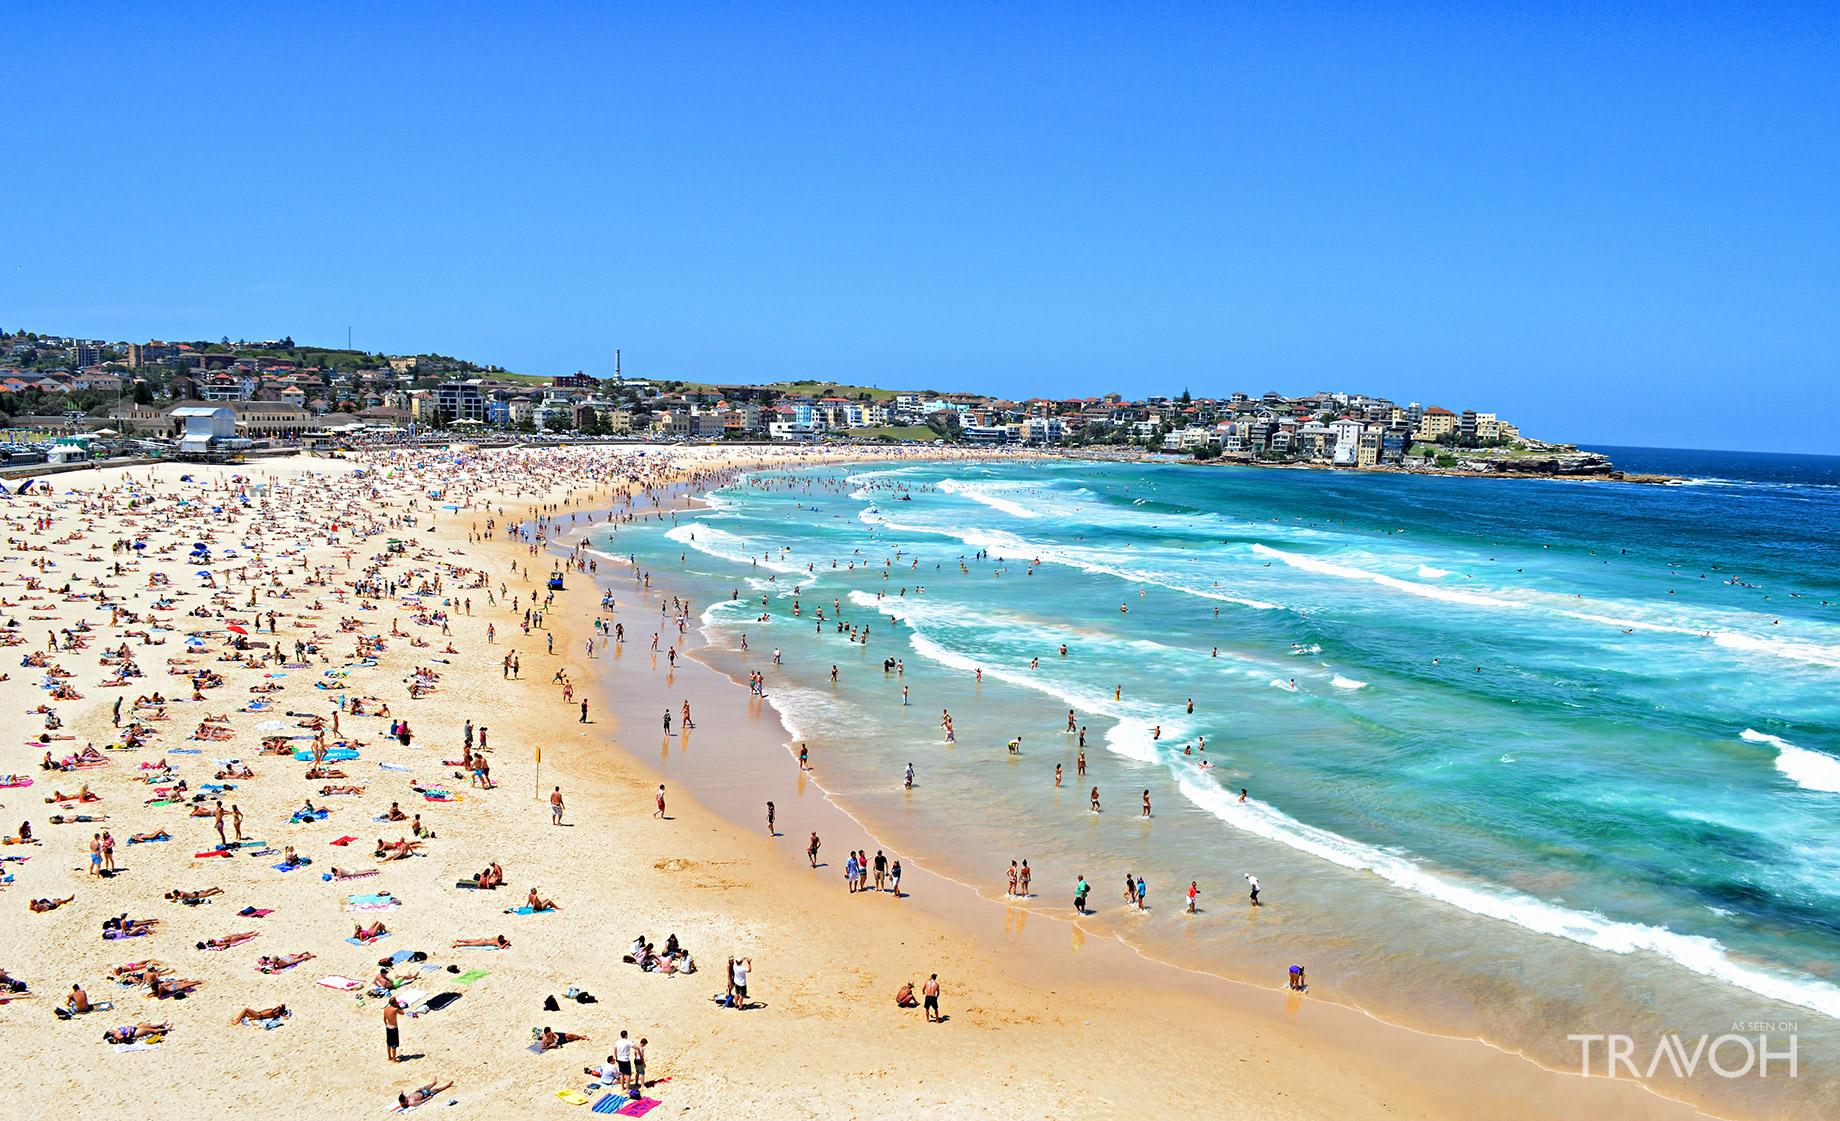 Bondi Beach – Exploring 10 of the Top Beaches in Sydney, Australia